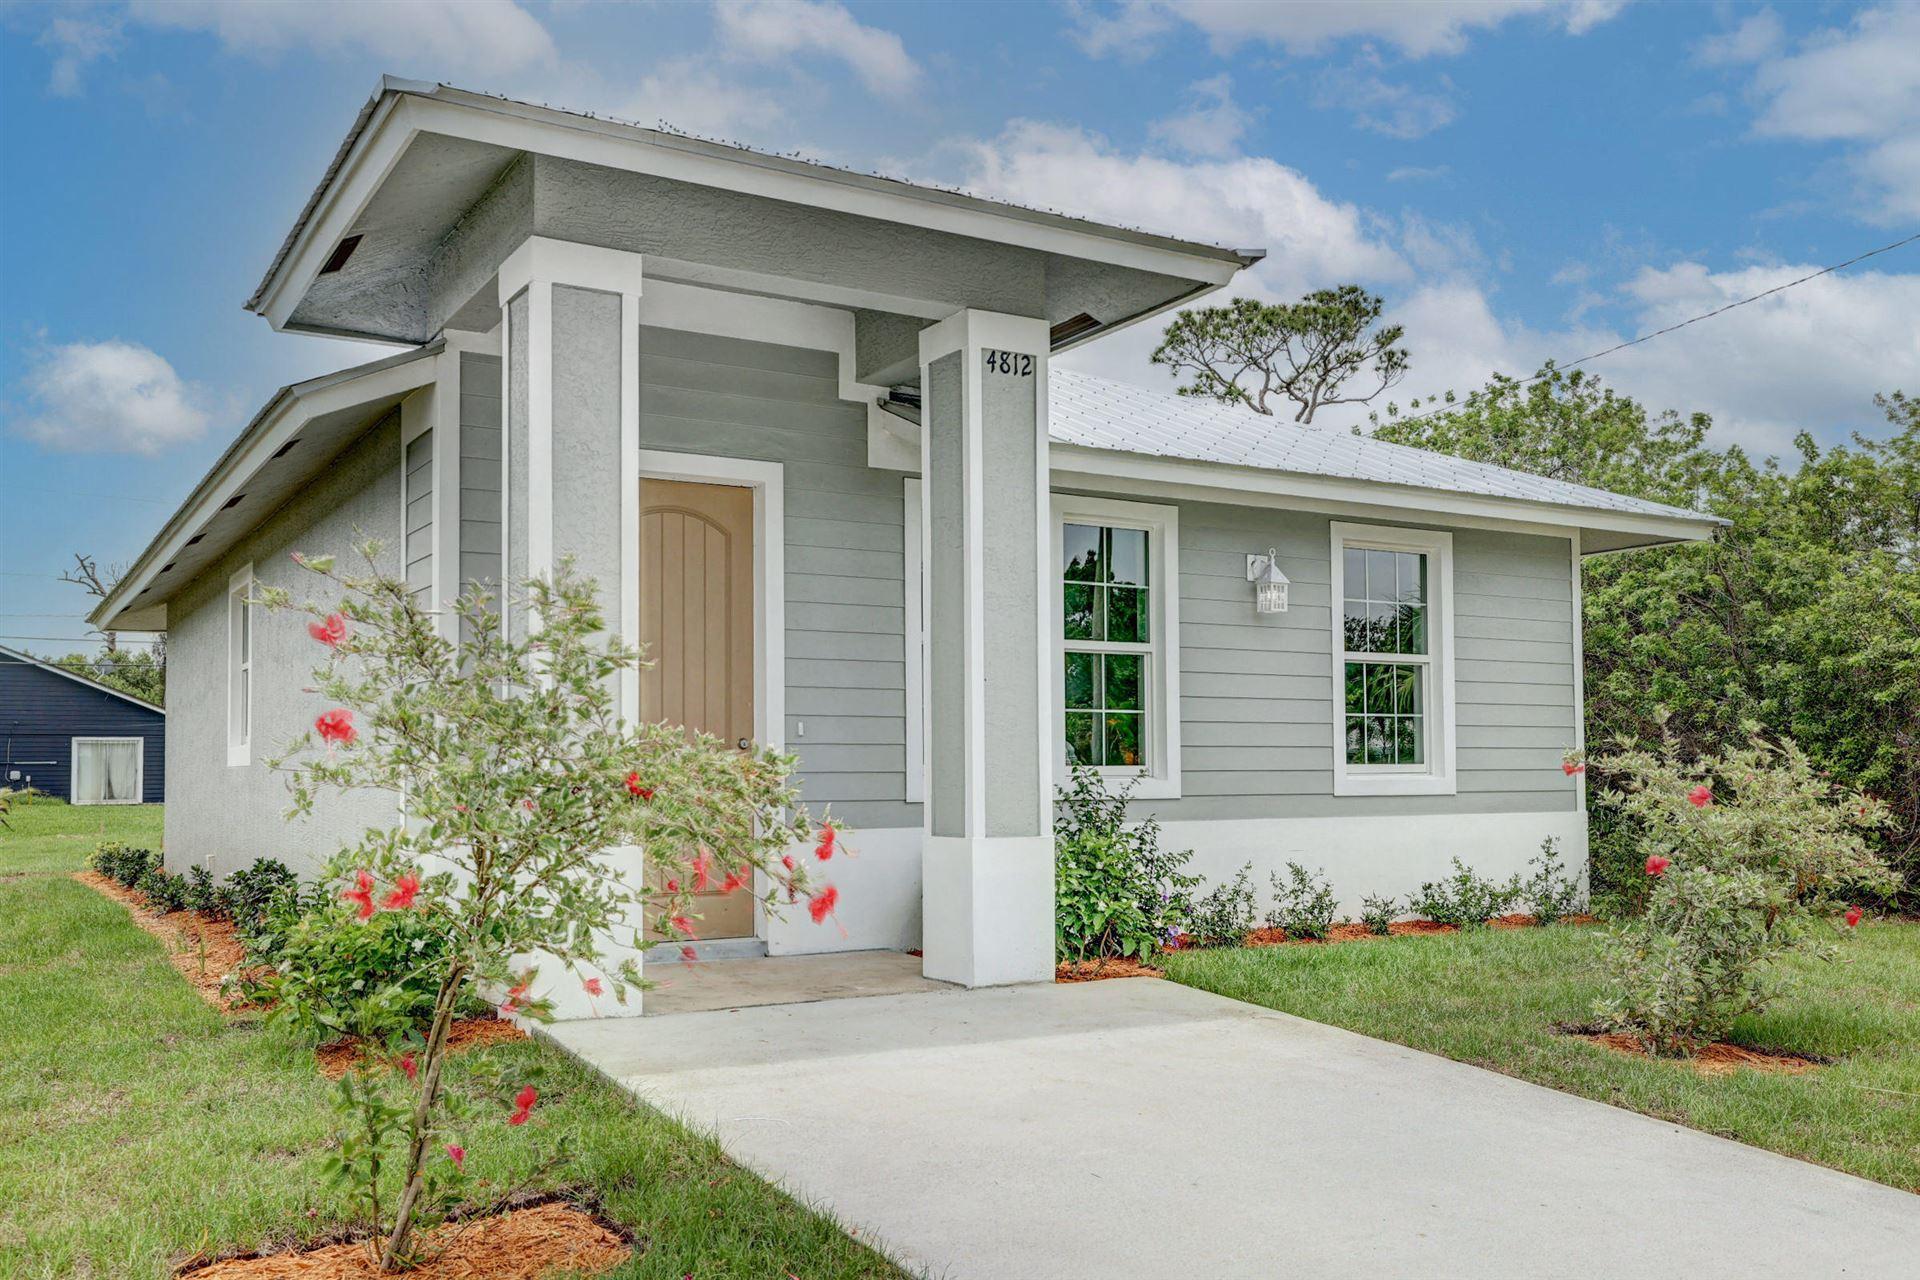 4812 SE Flounder Avenue, Stuart, FL 34997 - #: RX-10701177